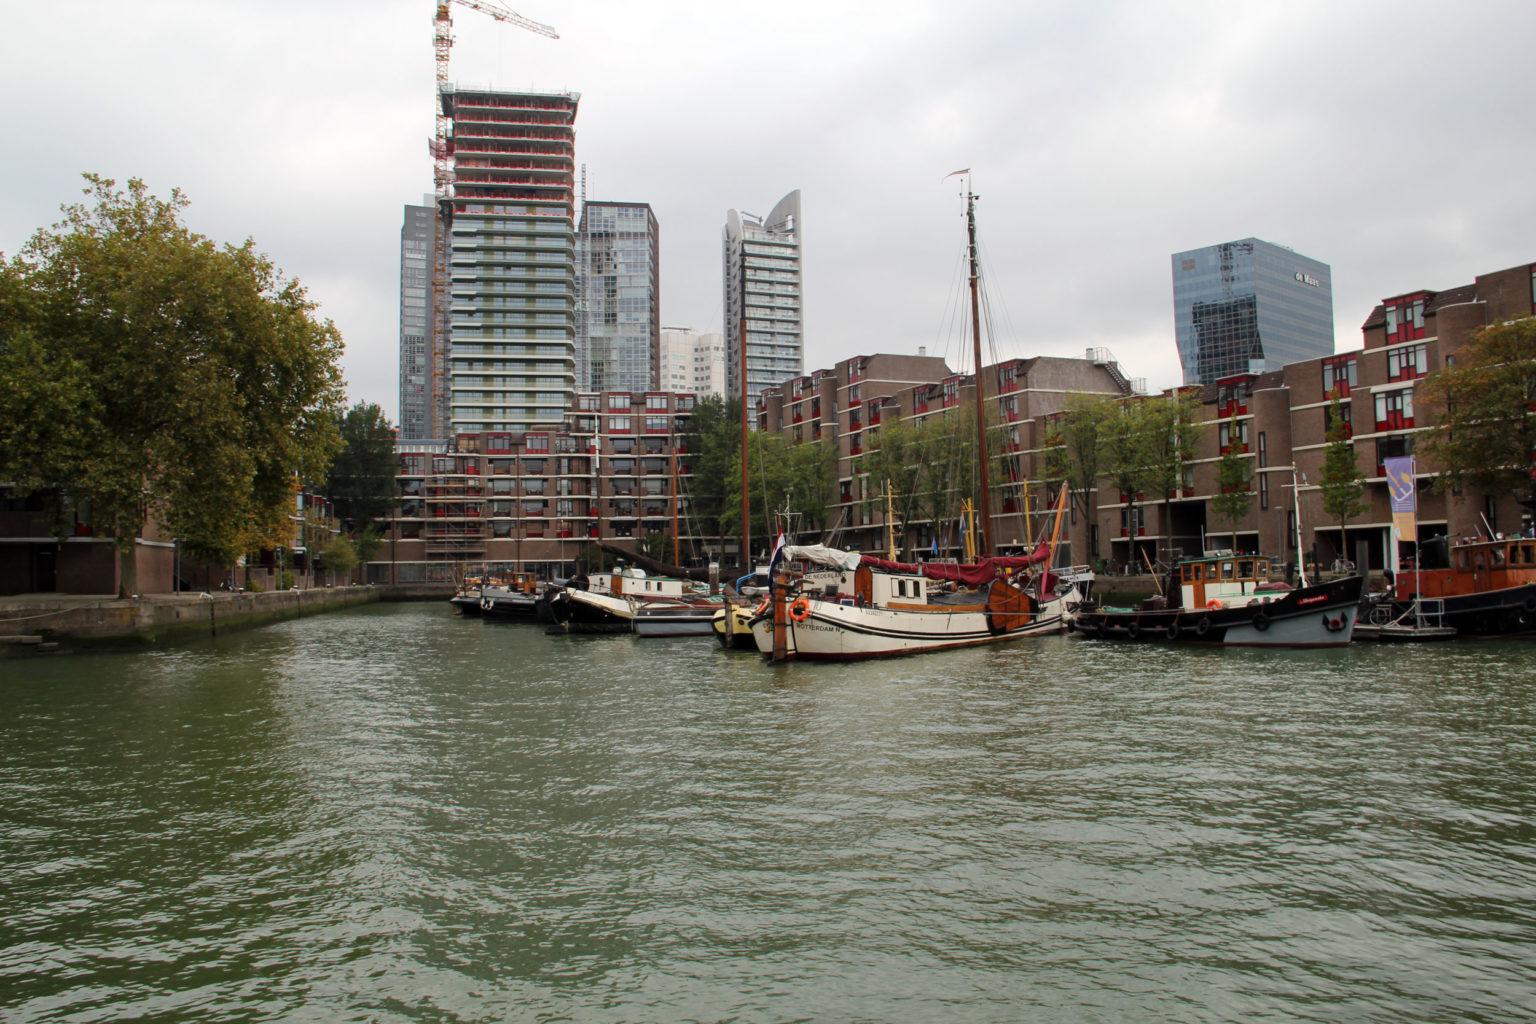 Rotterdamm Boote